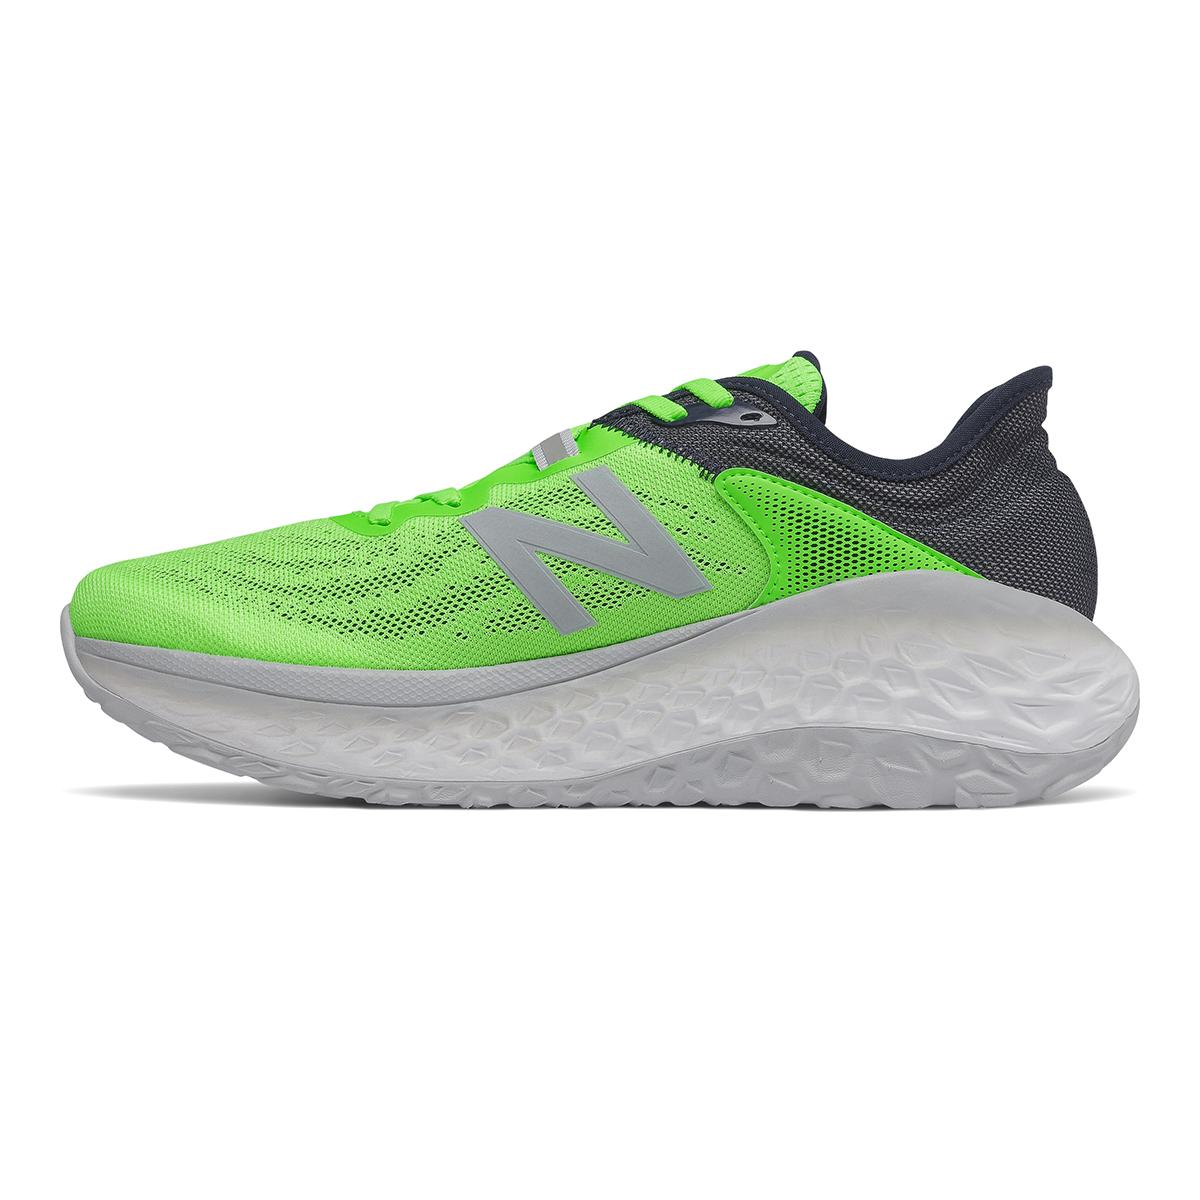 Men's New Balance Fresh Foam More V2 Running Shoe - Color: Energy Lime - Size: 7 - Width: Wide, Energy Lime, large, image 2